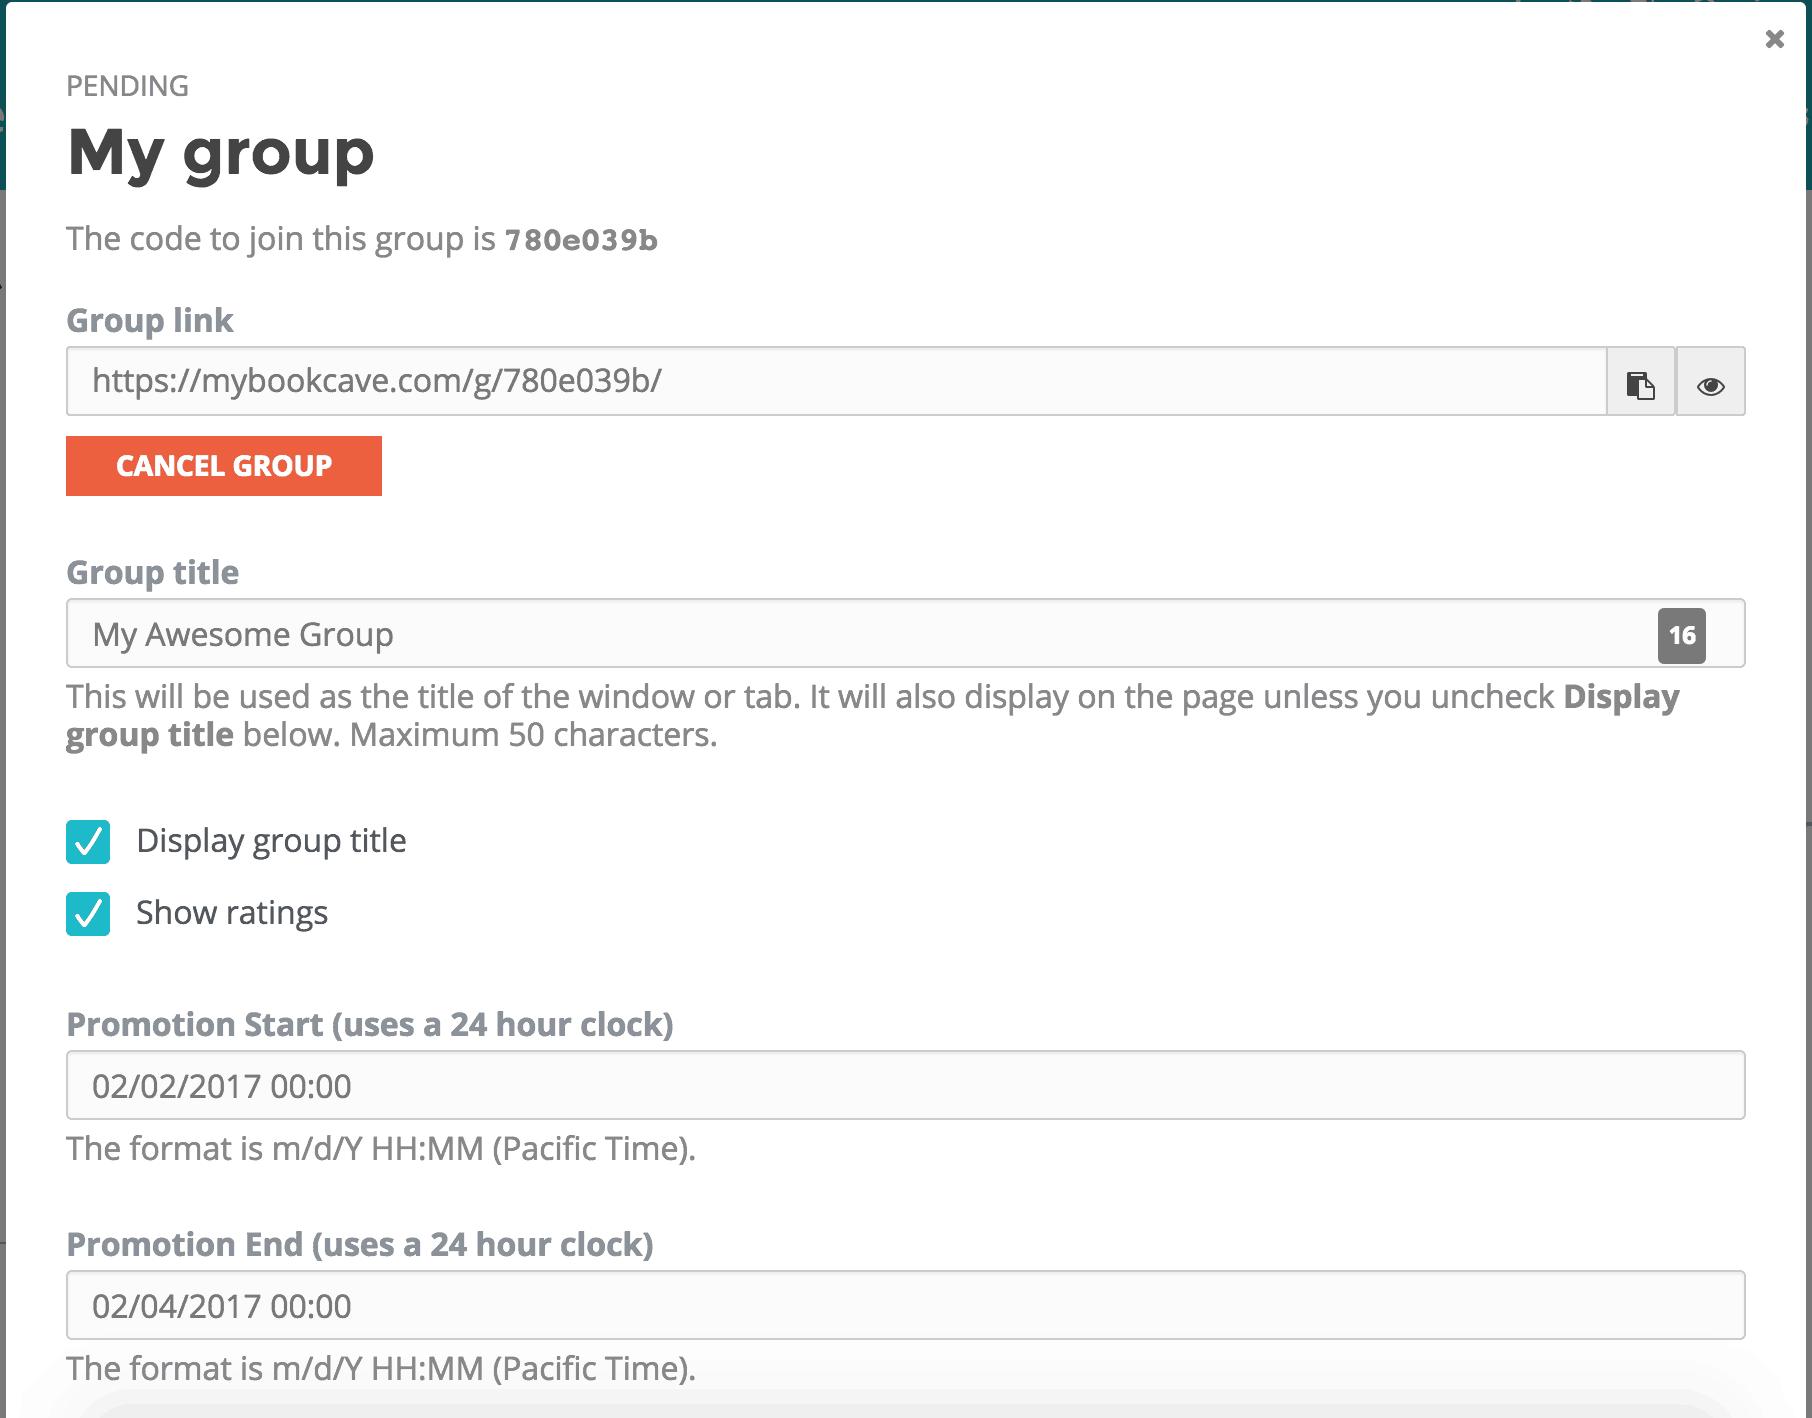 group promotion details